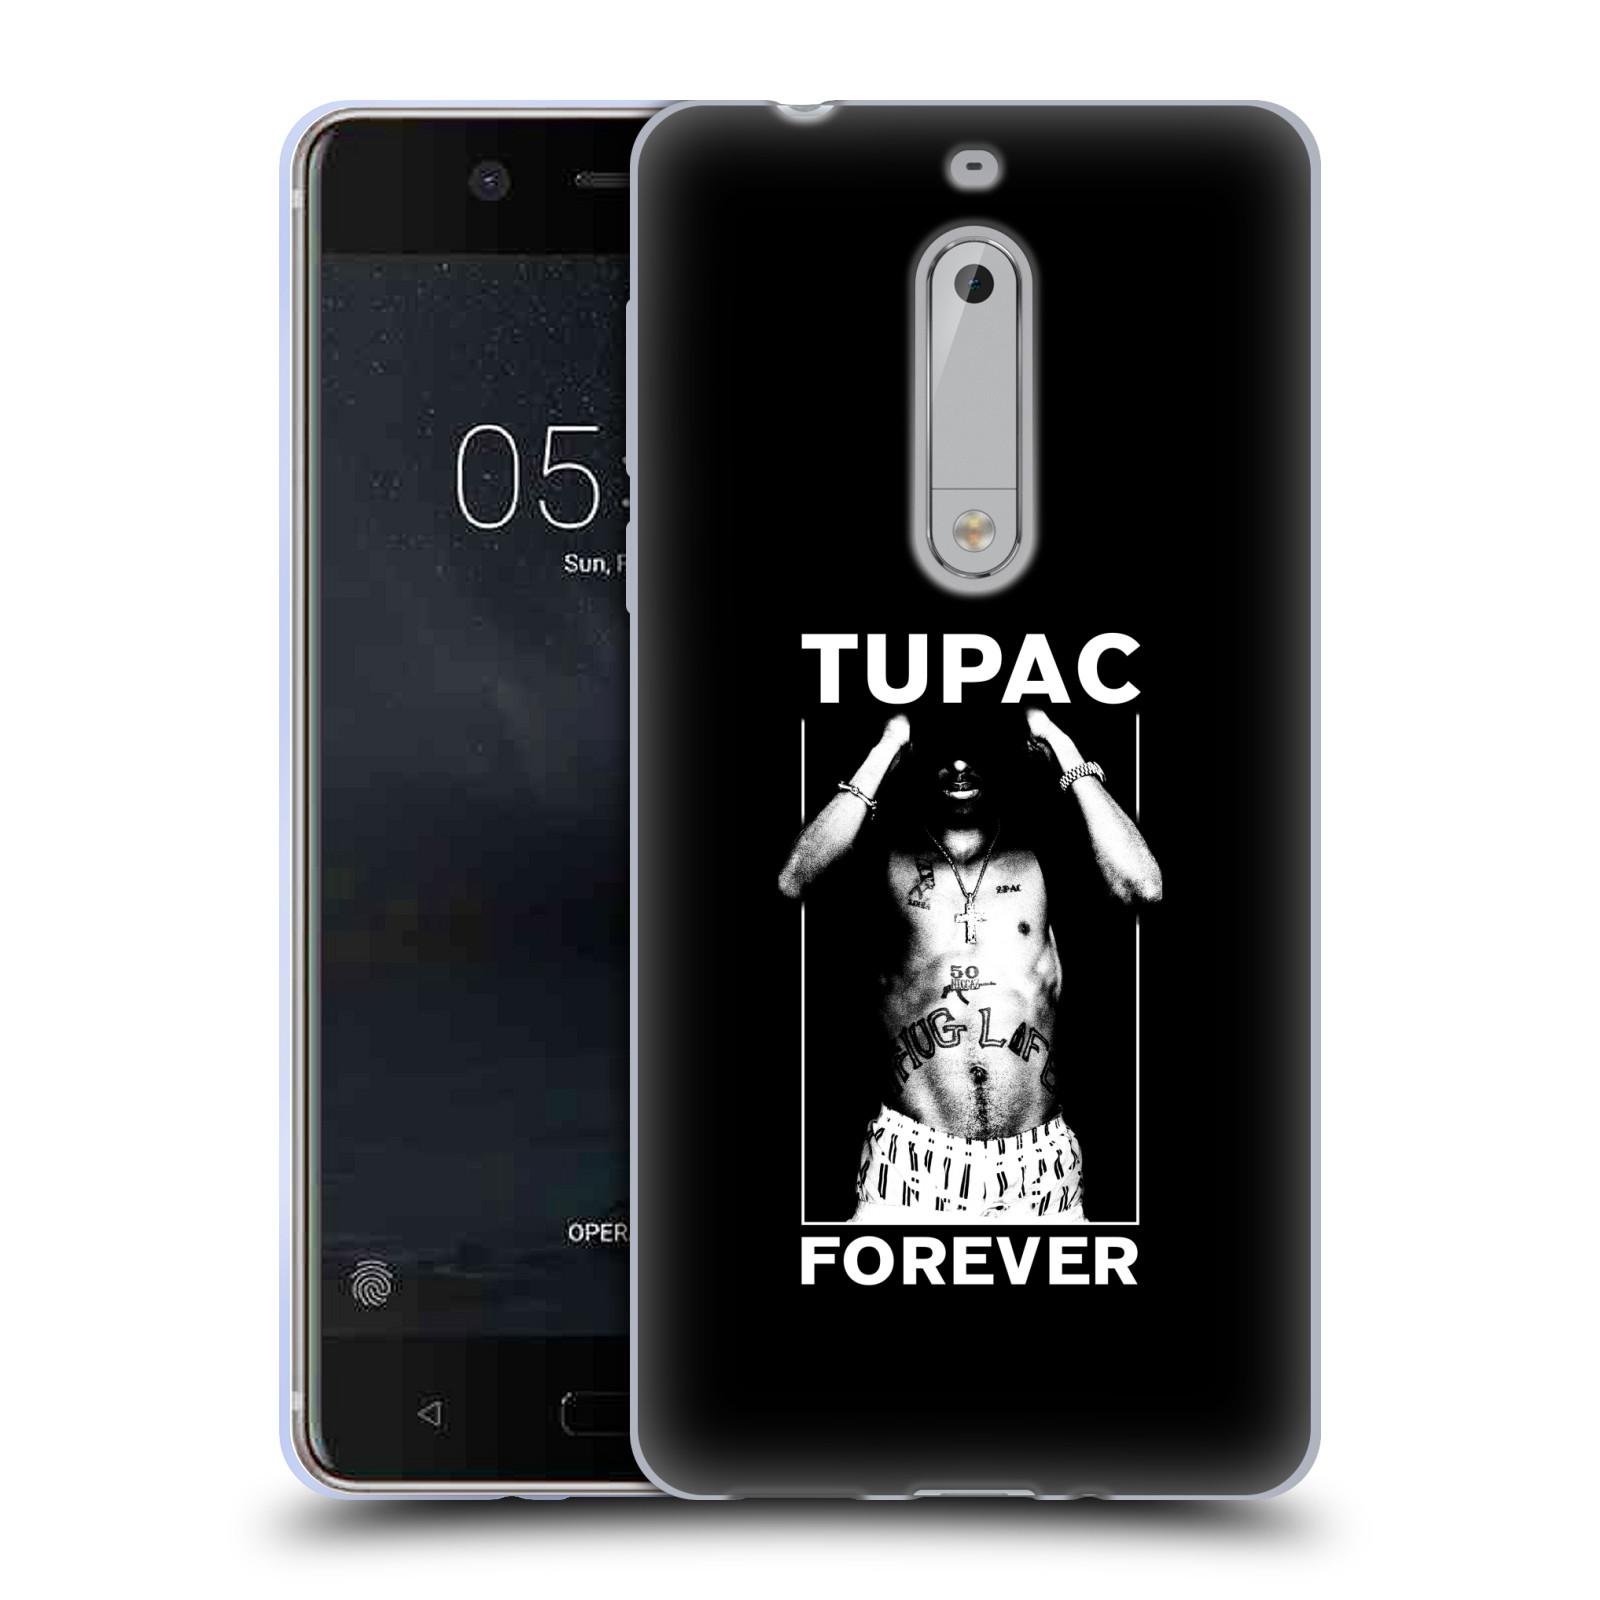 HEAD CASE silikonový obal na mobil Nokia 5 Zpěvák rapper Tupac Shakur 2Pac bílý popisek FOREVER